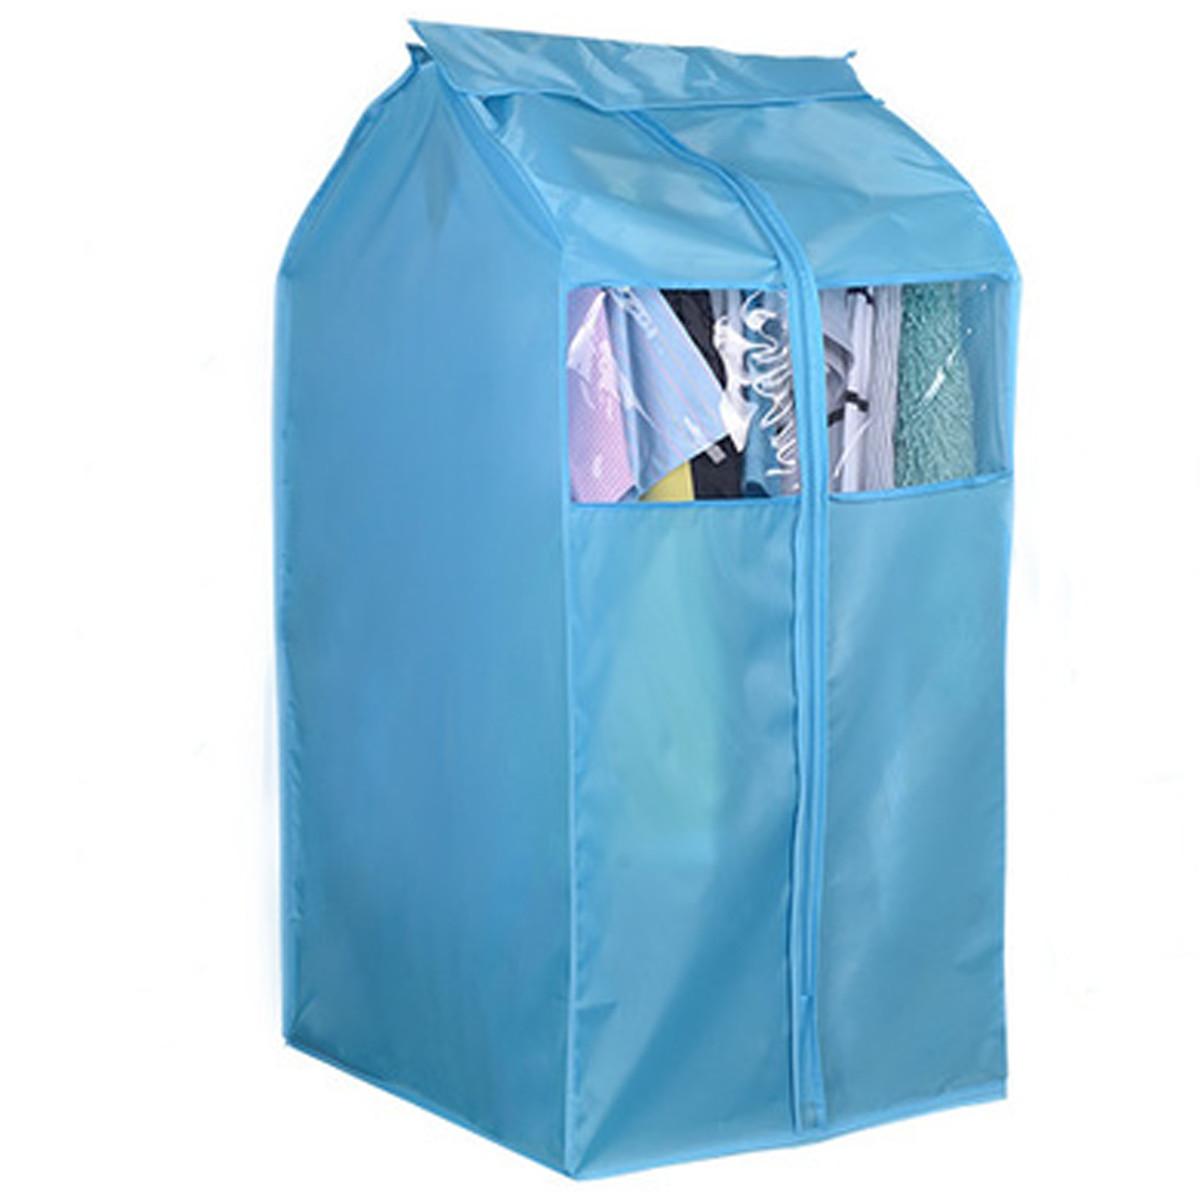 oxford cloth hanging storage bag garment suit coat cover protector wardrobe ebay. Black Bedroom Furniture Sets. Home Design Ideas